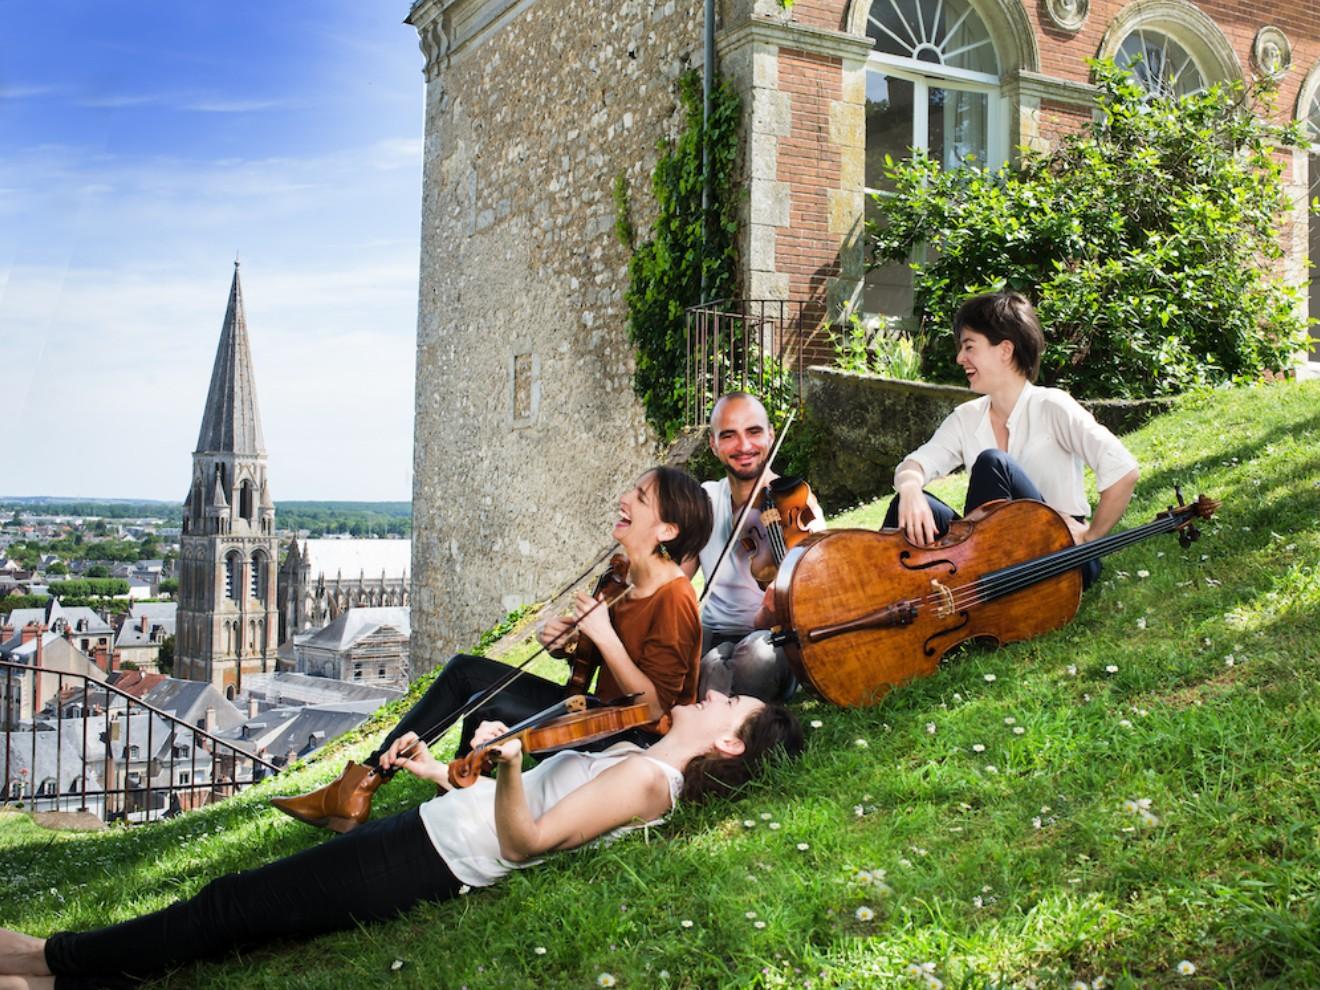 quatuor-voce-a-vendome